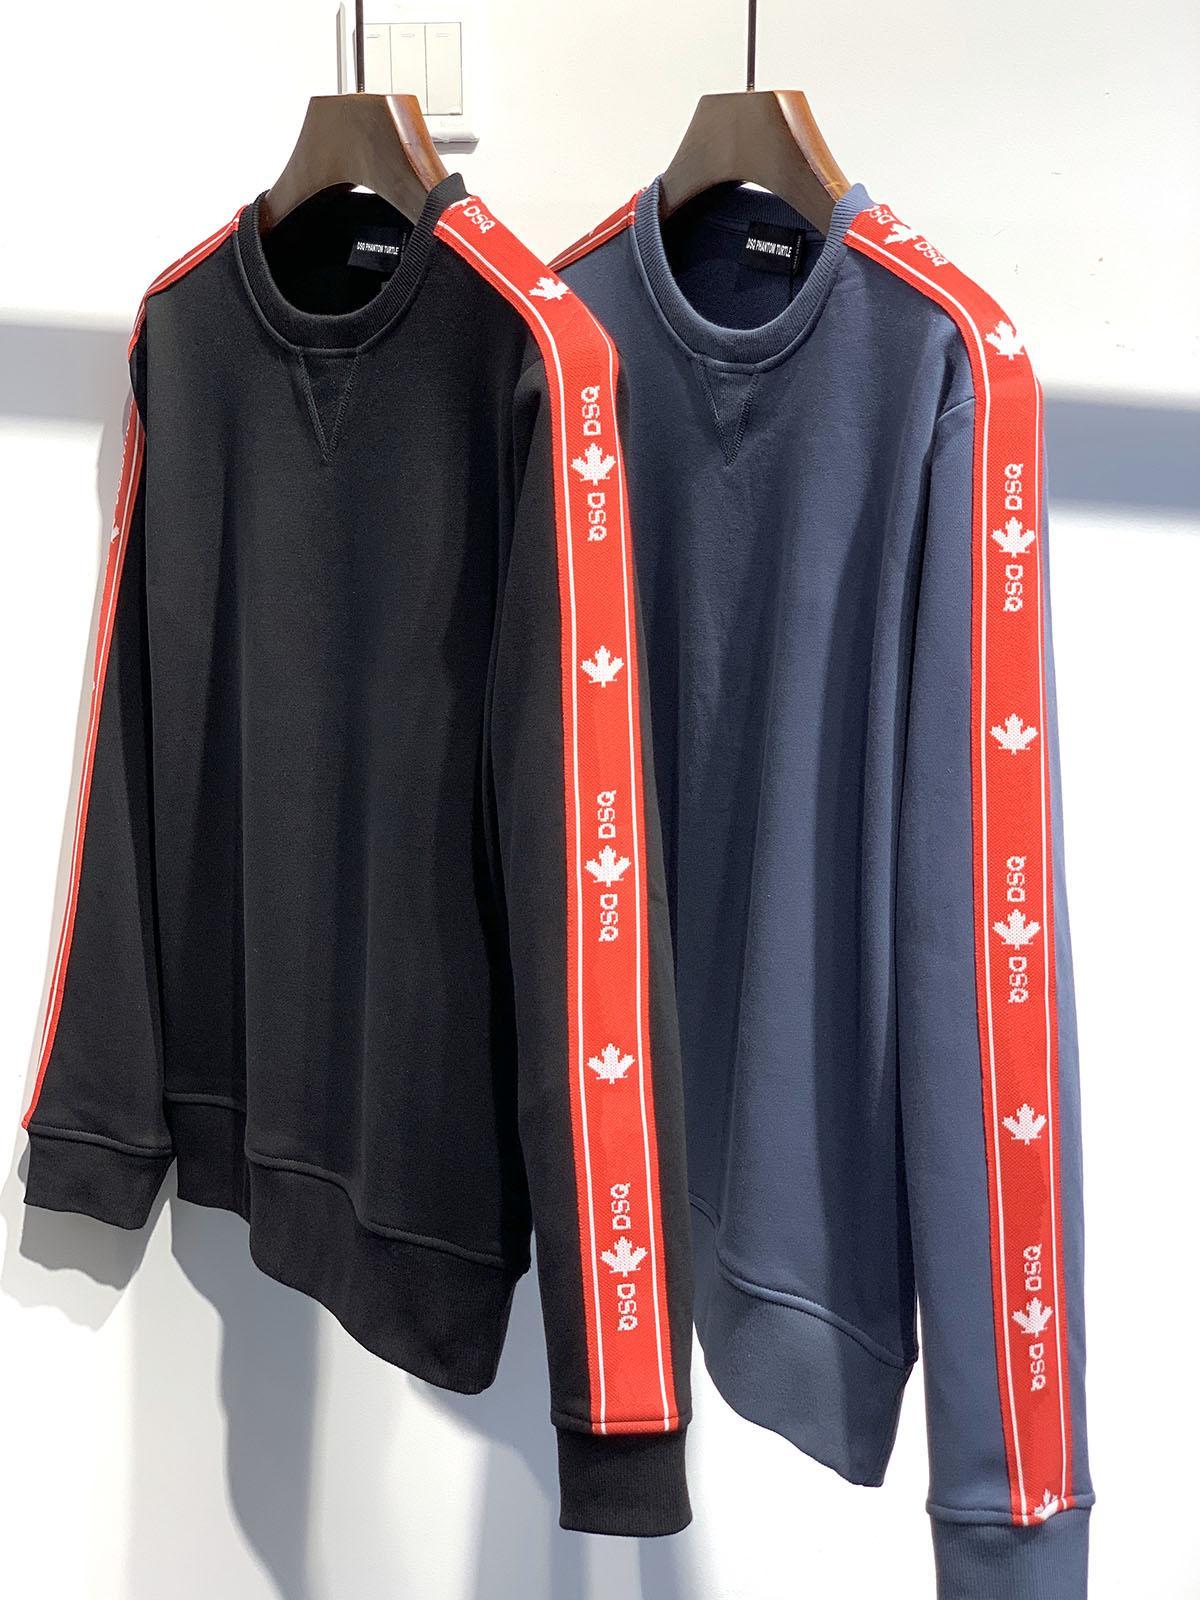 DSQ Phantom Turtle Hoody New Herren Designer Hoodies Italien Mode Sweatshirts Herbst Druck DSQ Hoodie Männliche Top Qualität 100% Baumwolle Tops 01216